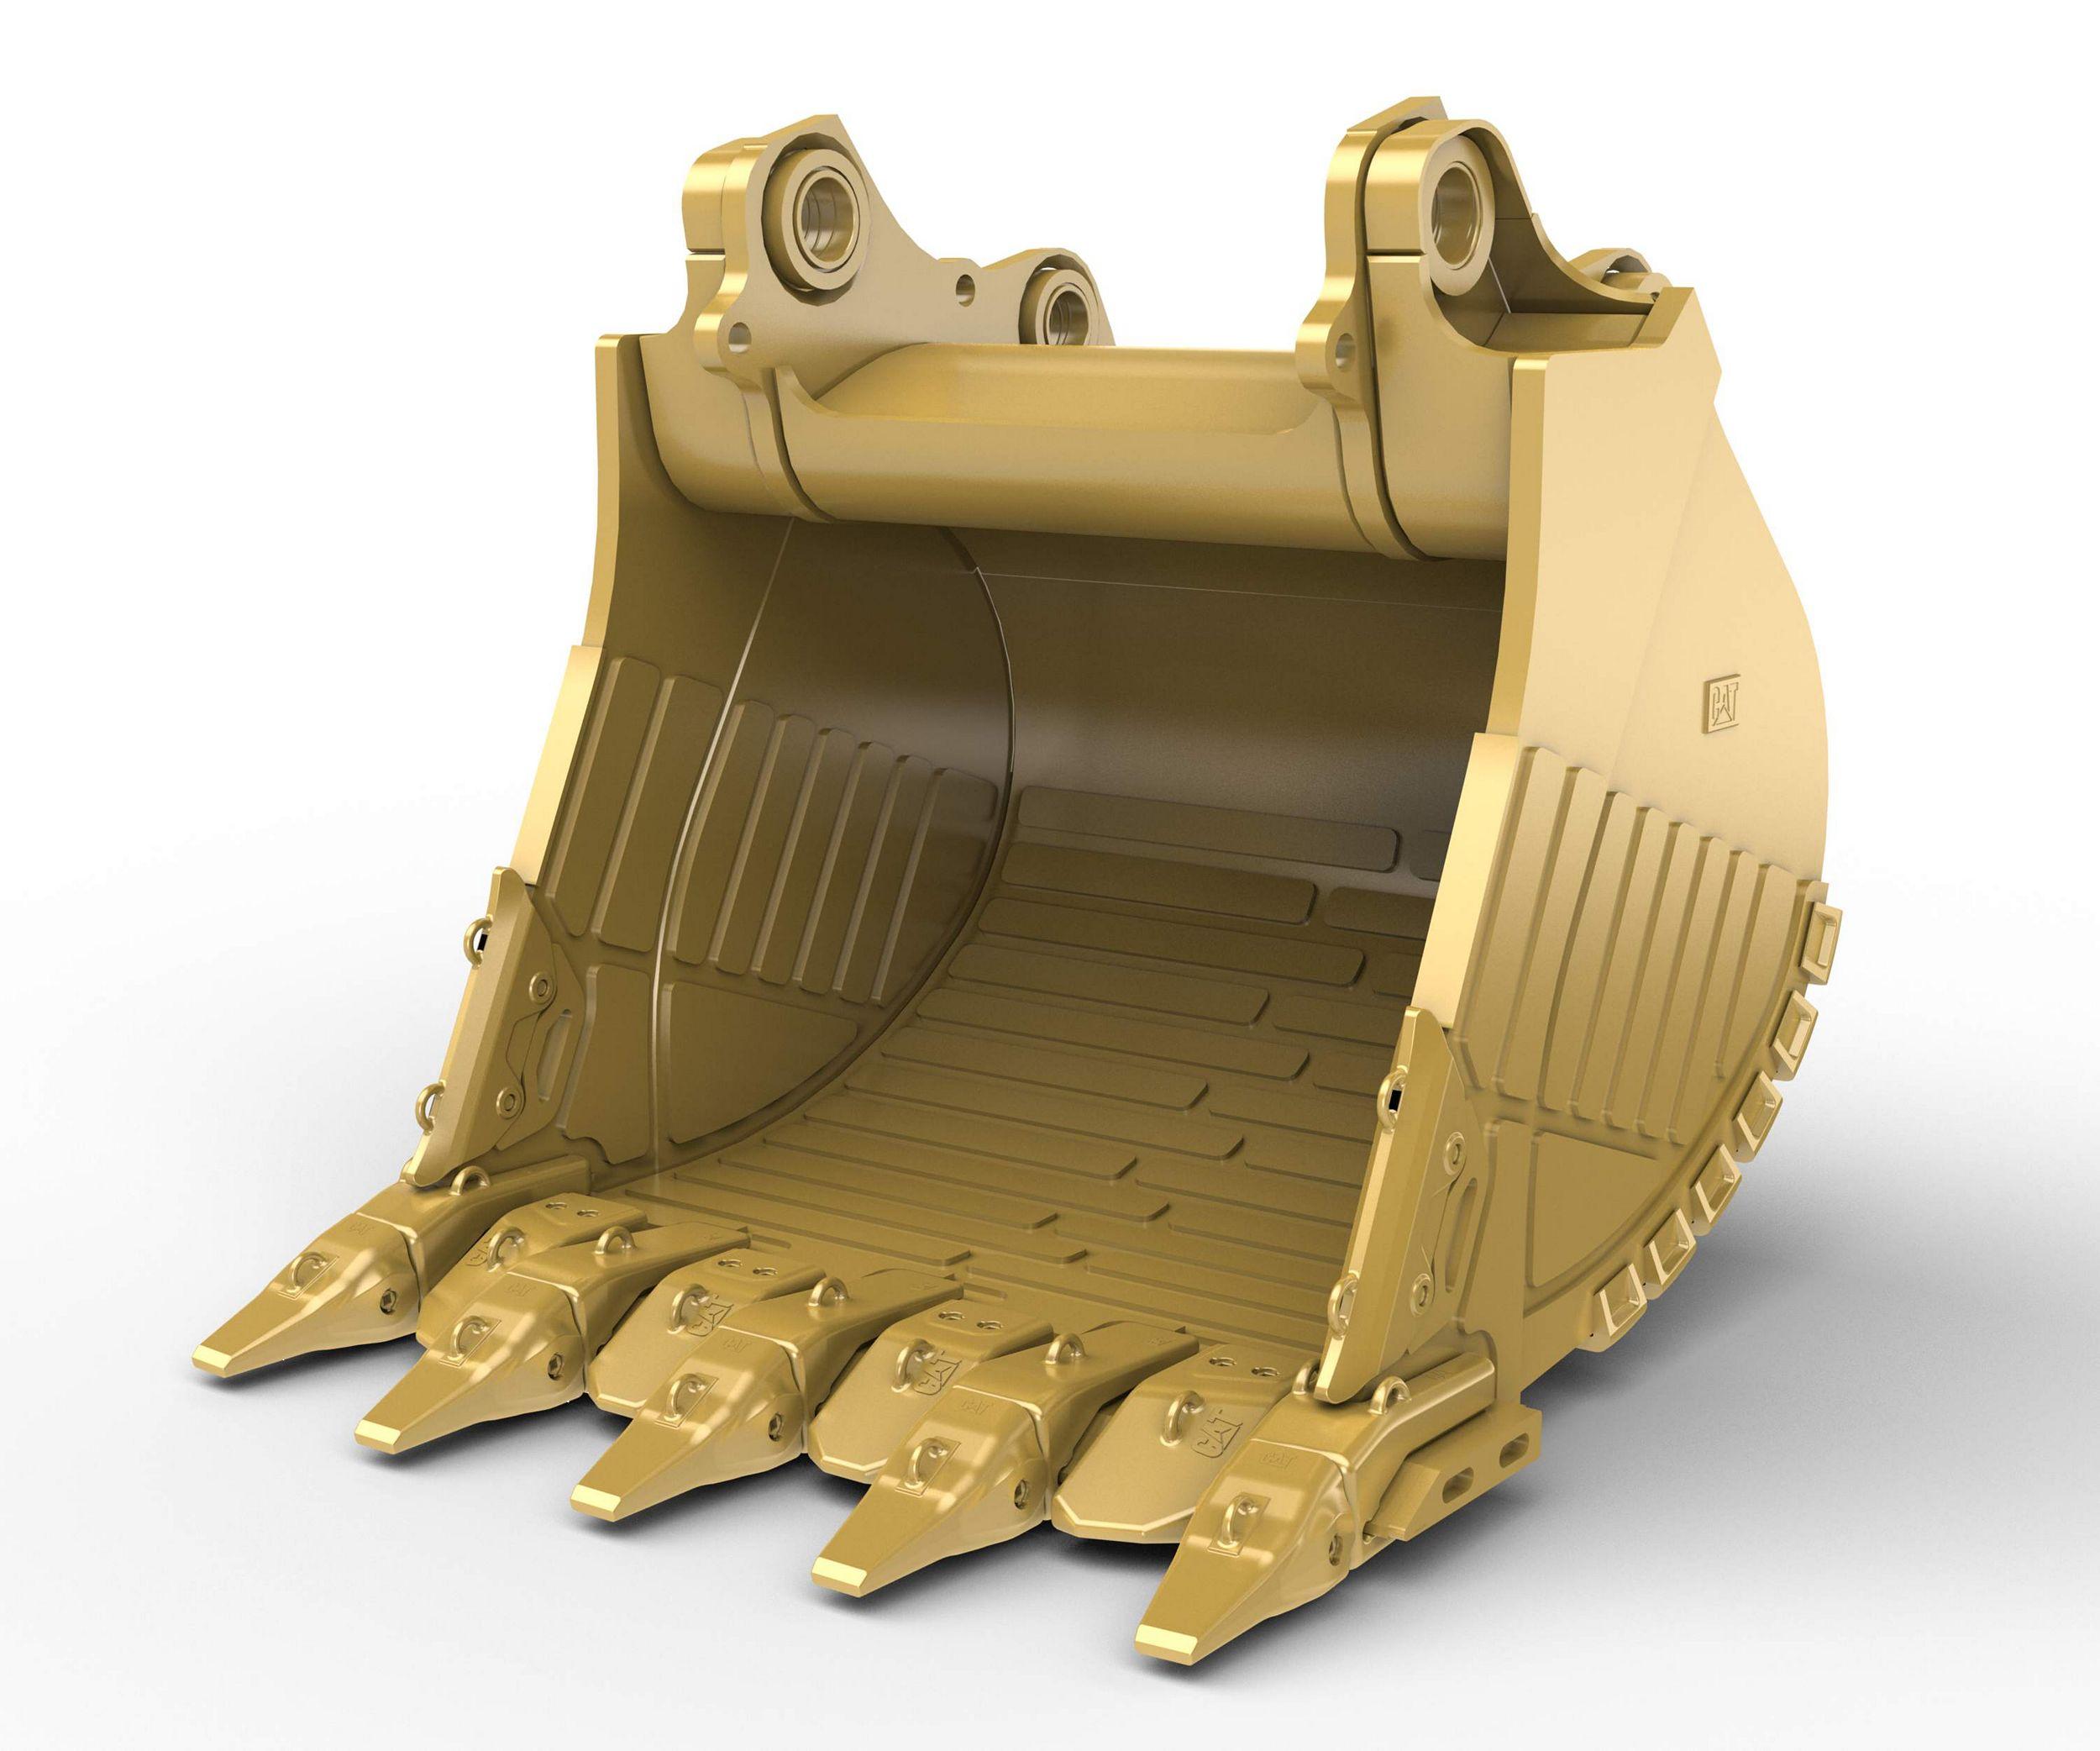 9m³ (11.8yd³) Heavy Rock bucket for the 6020B Hyd Mining Shovel